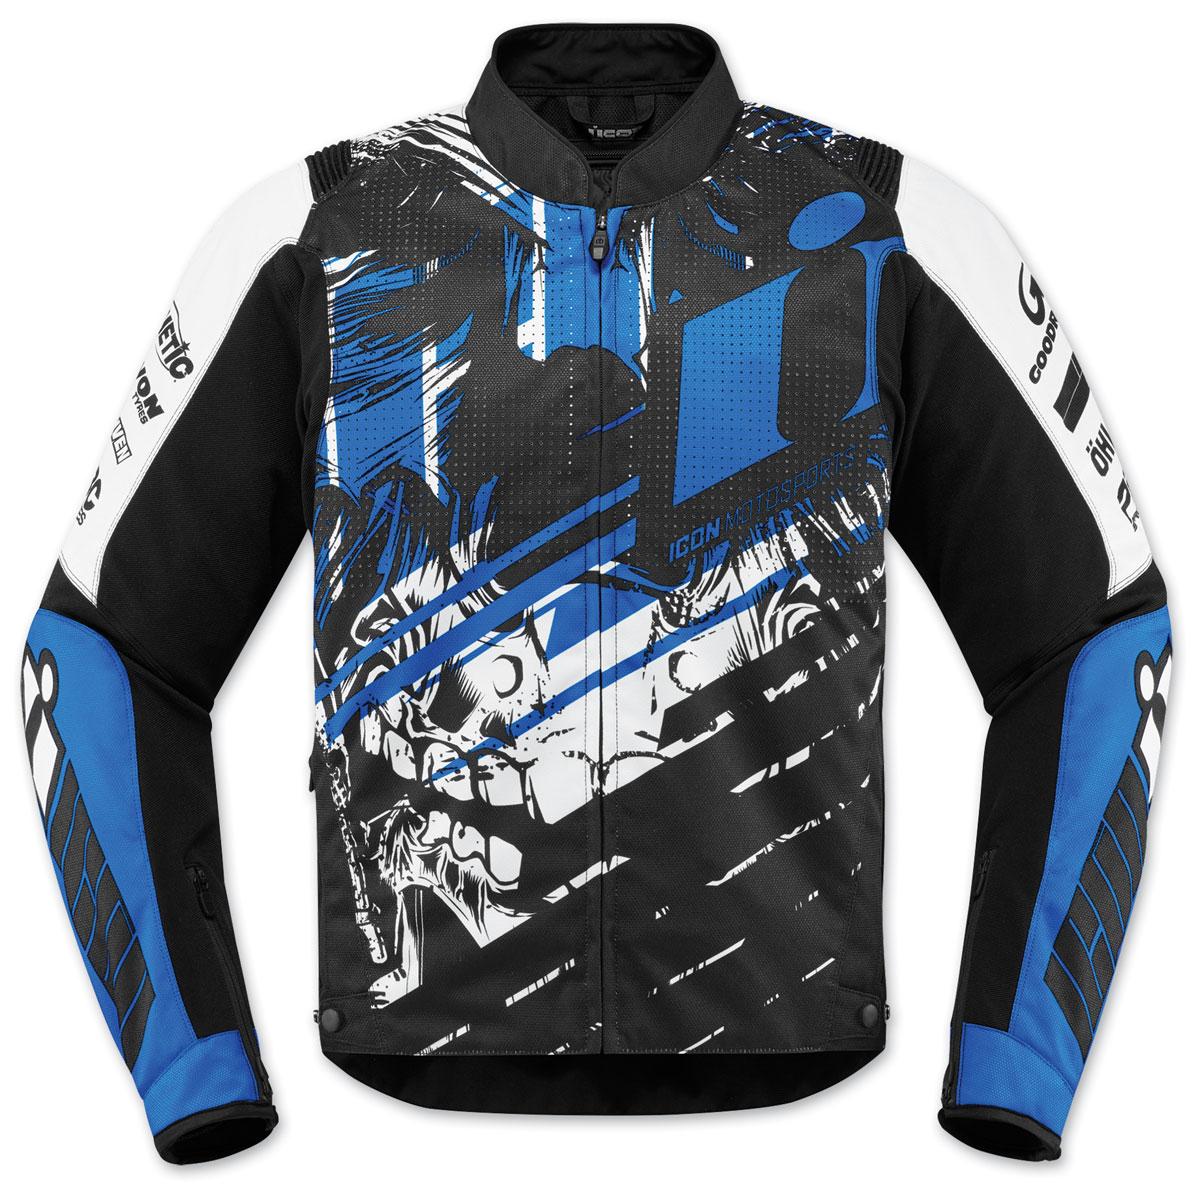 ICON Men's Overlord SB2 STIM Blue Jacket